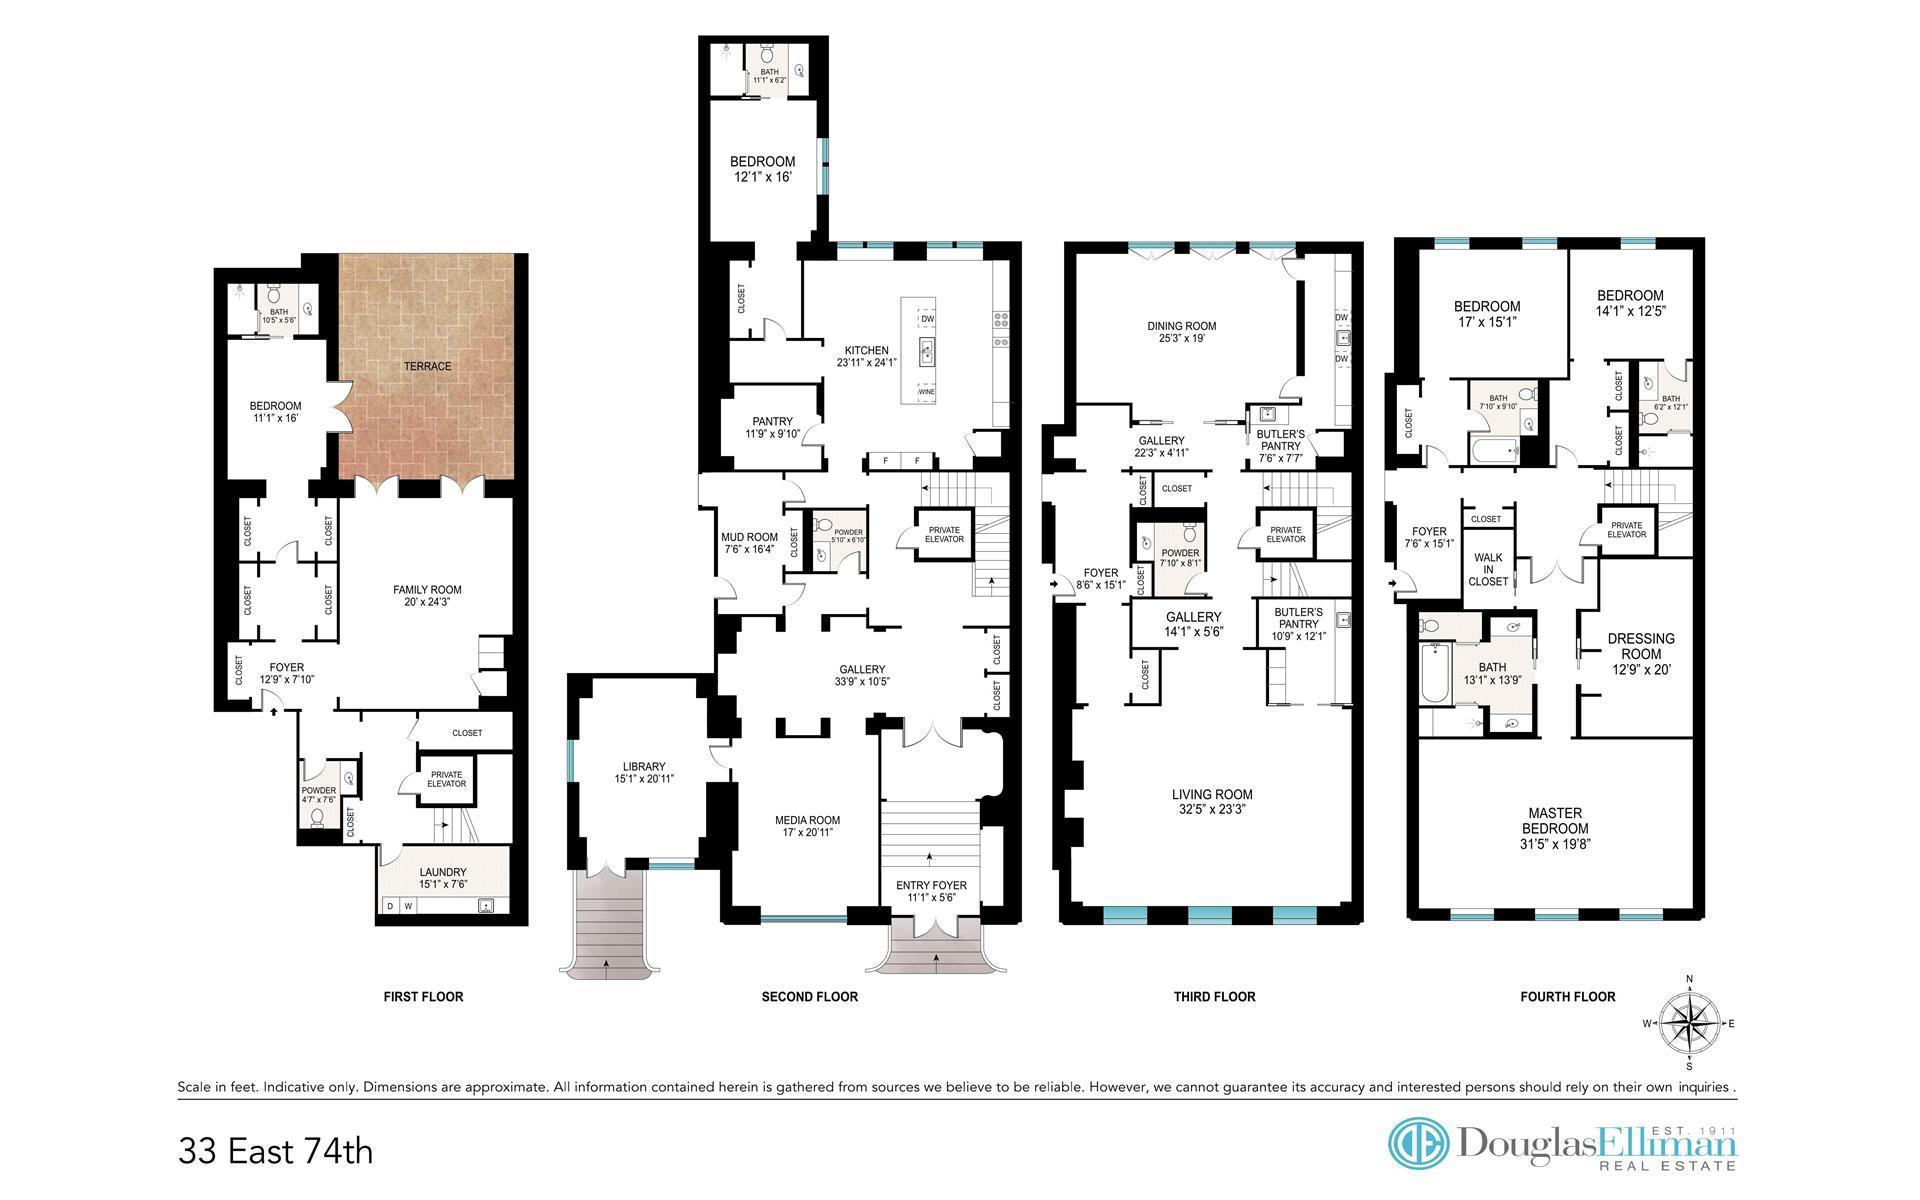 Floor plan of 33 East 74th St, TH - Upper East Side, New York